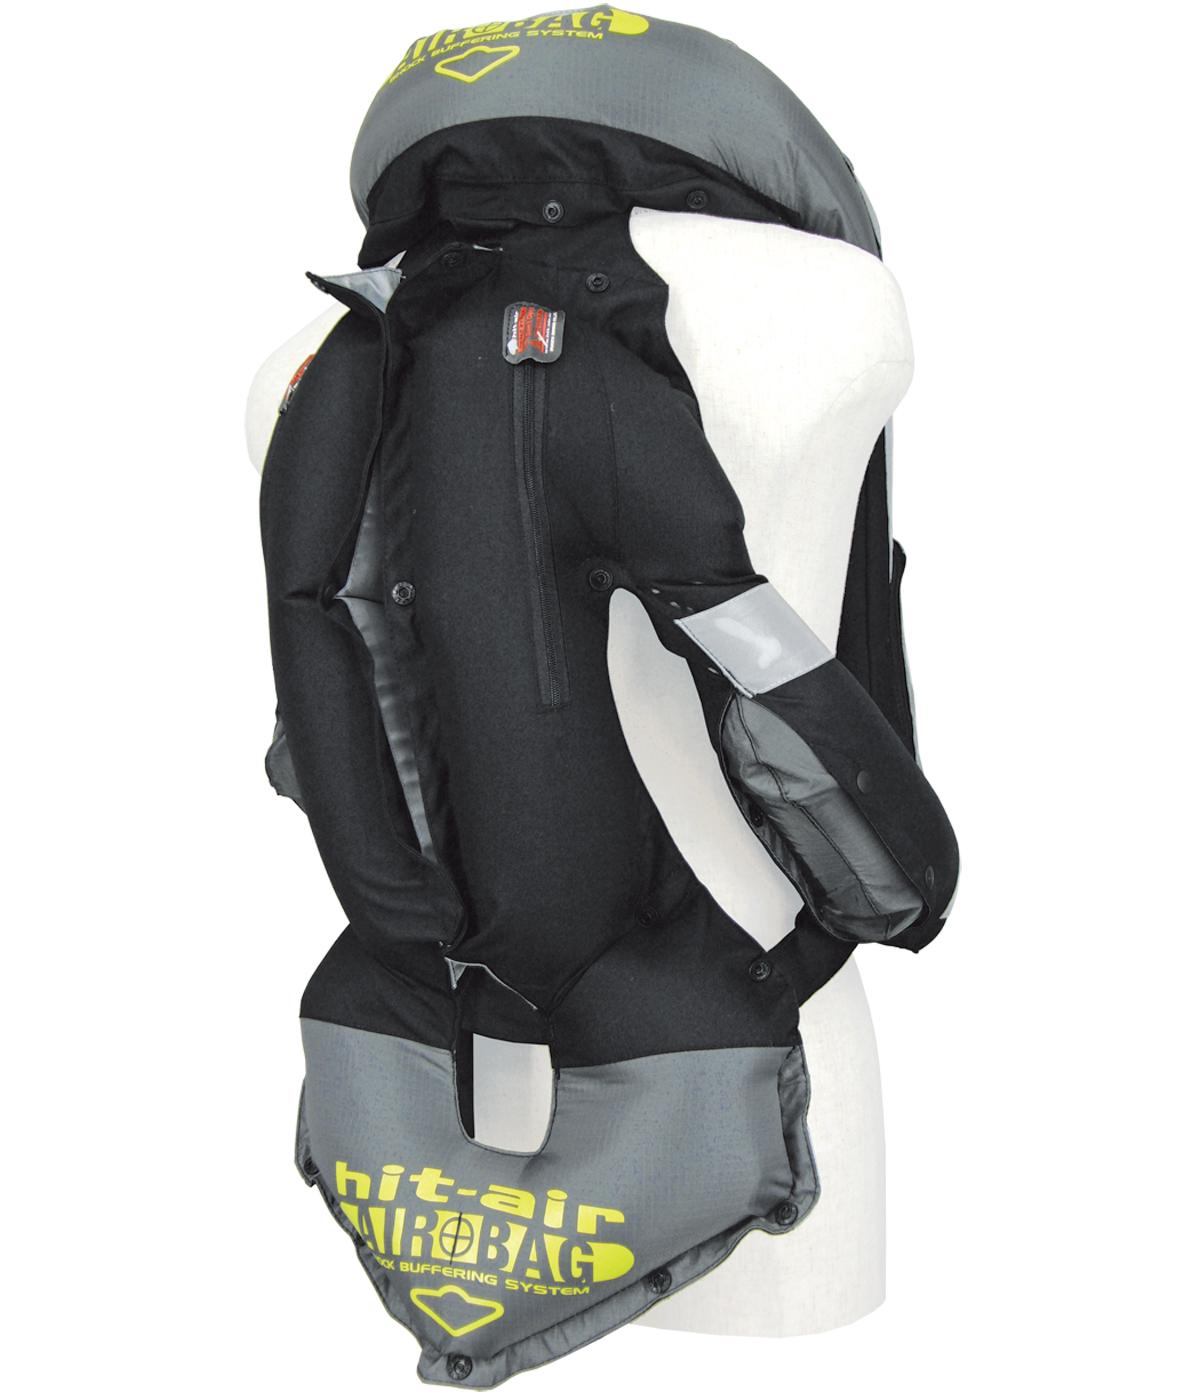 Black airbag back